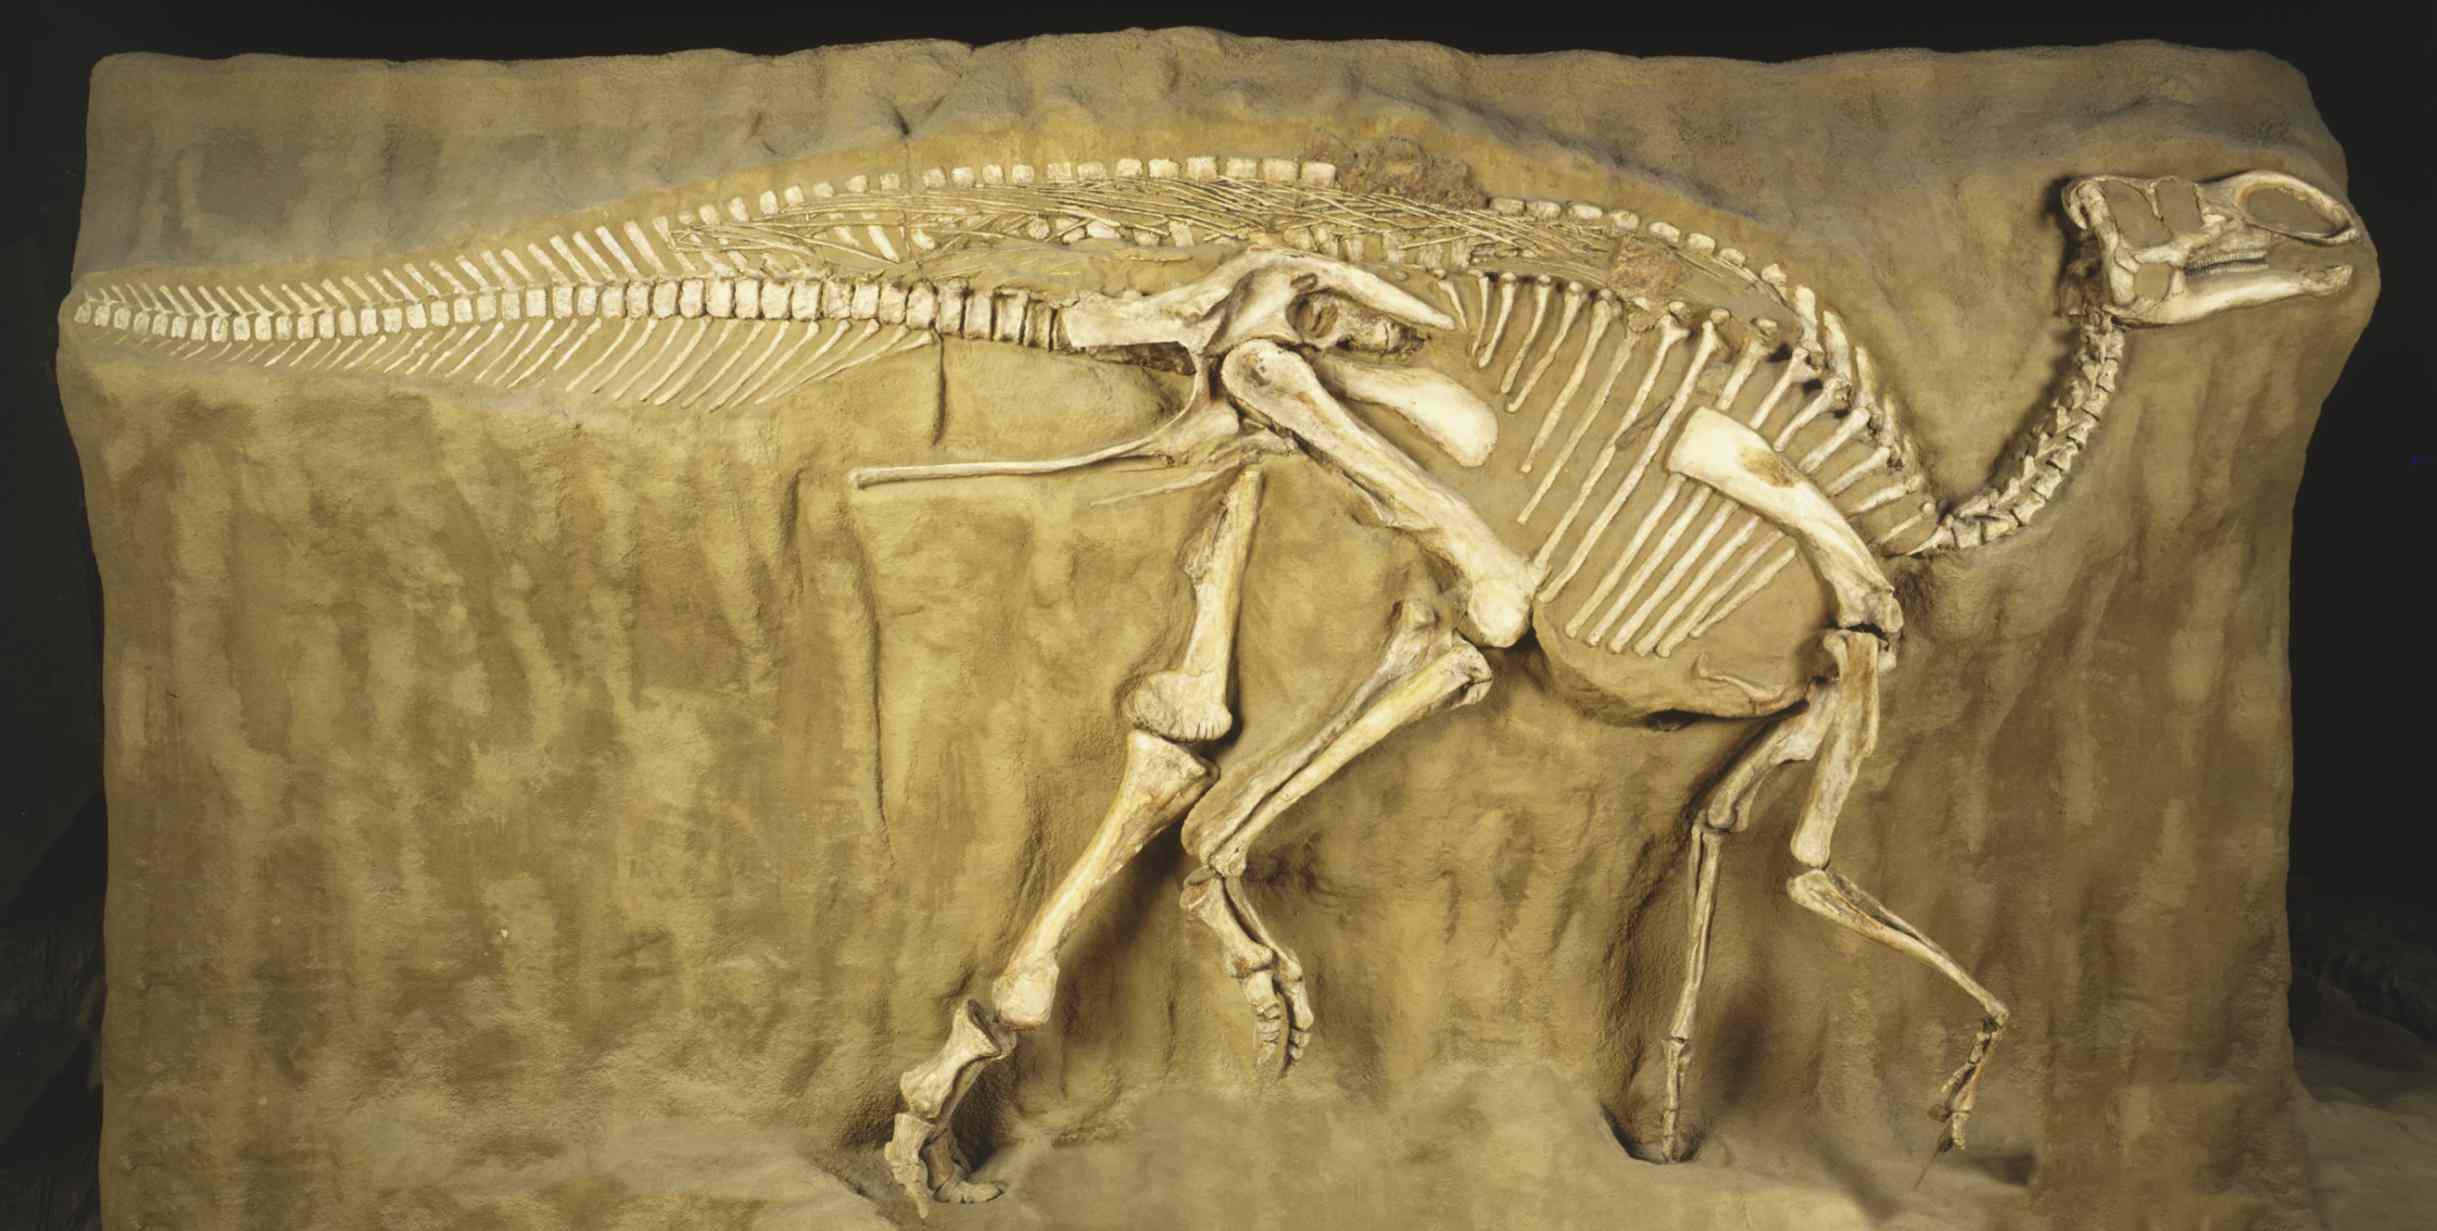 EEsqueleto de dinosaurio fosilizadol registro fosil